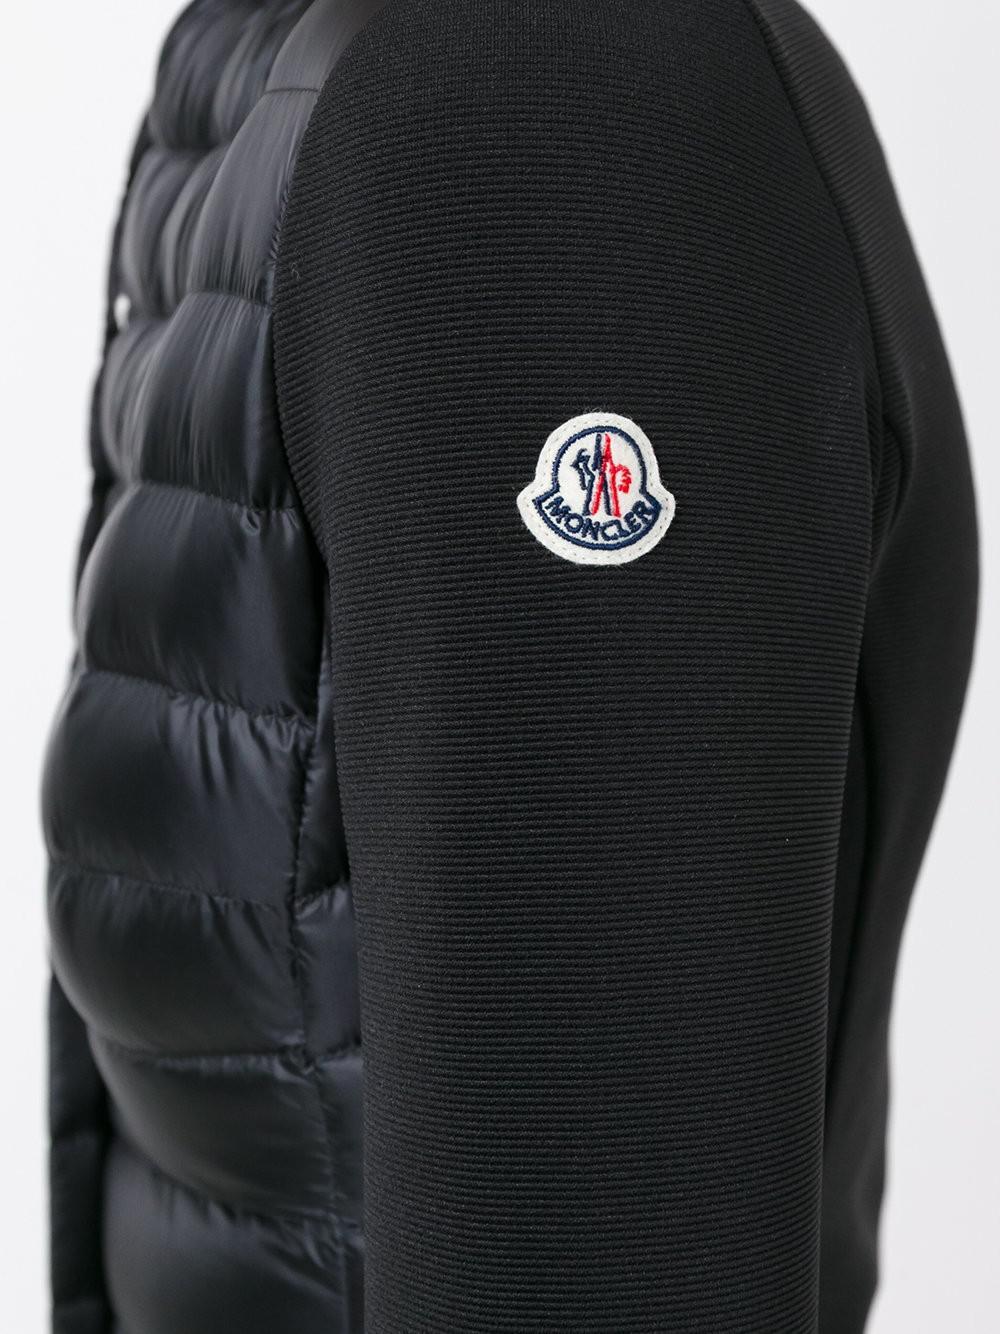 Lyst - Moncler Blen Padded Jacket in Black